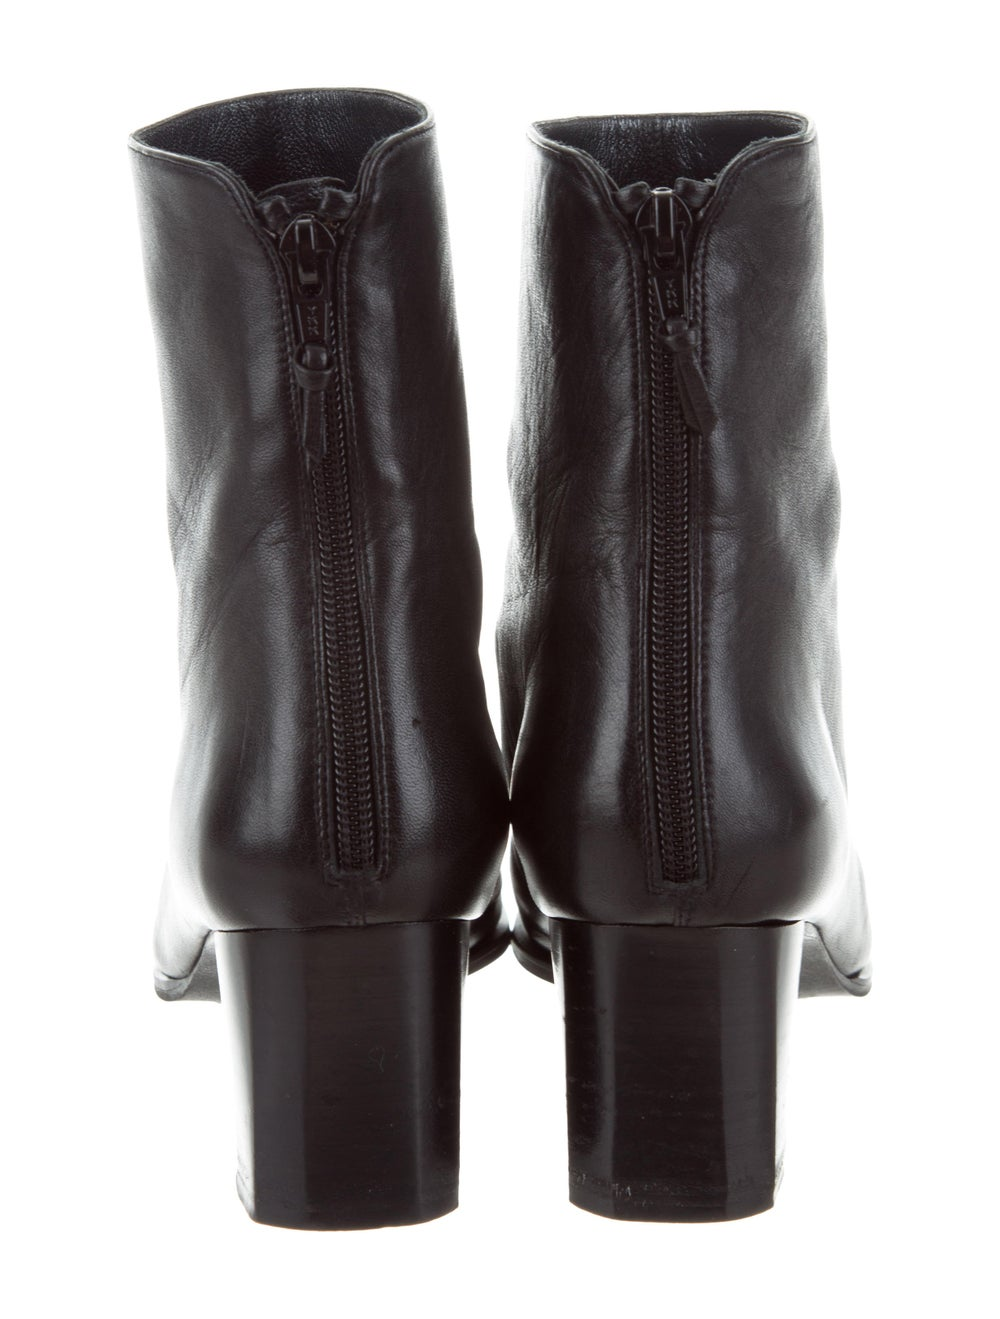 Stuart Weitzman Leather Square-Toe Ankle Boots Bl… - image 4